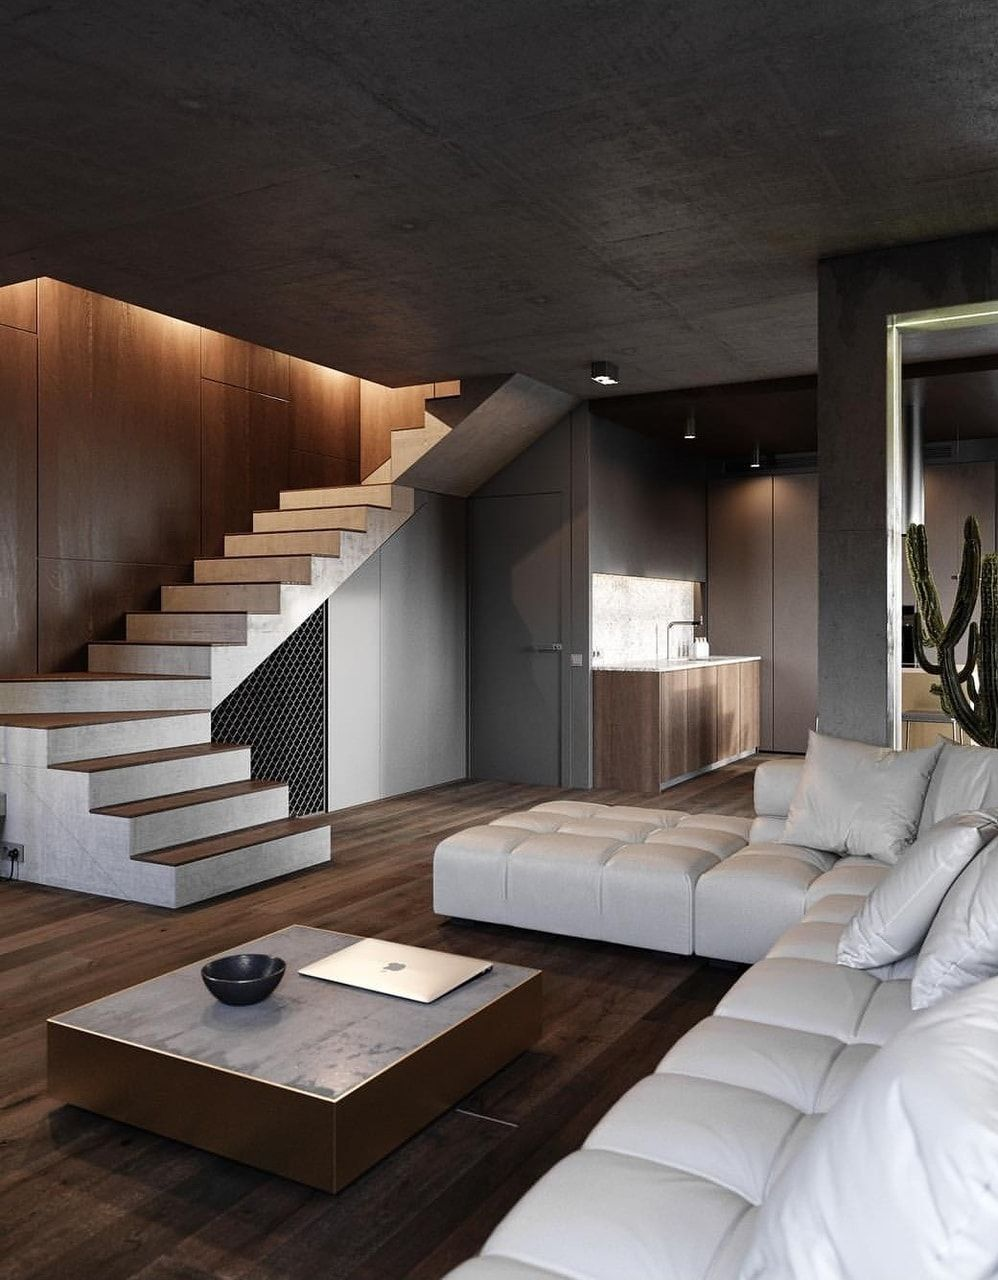 January 27 2020 At 10 37am In 2020 Modern House Design Modern Apartment Design Modern Houses Interior